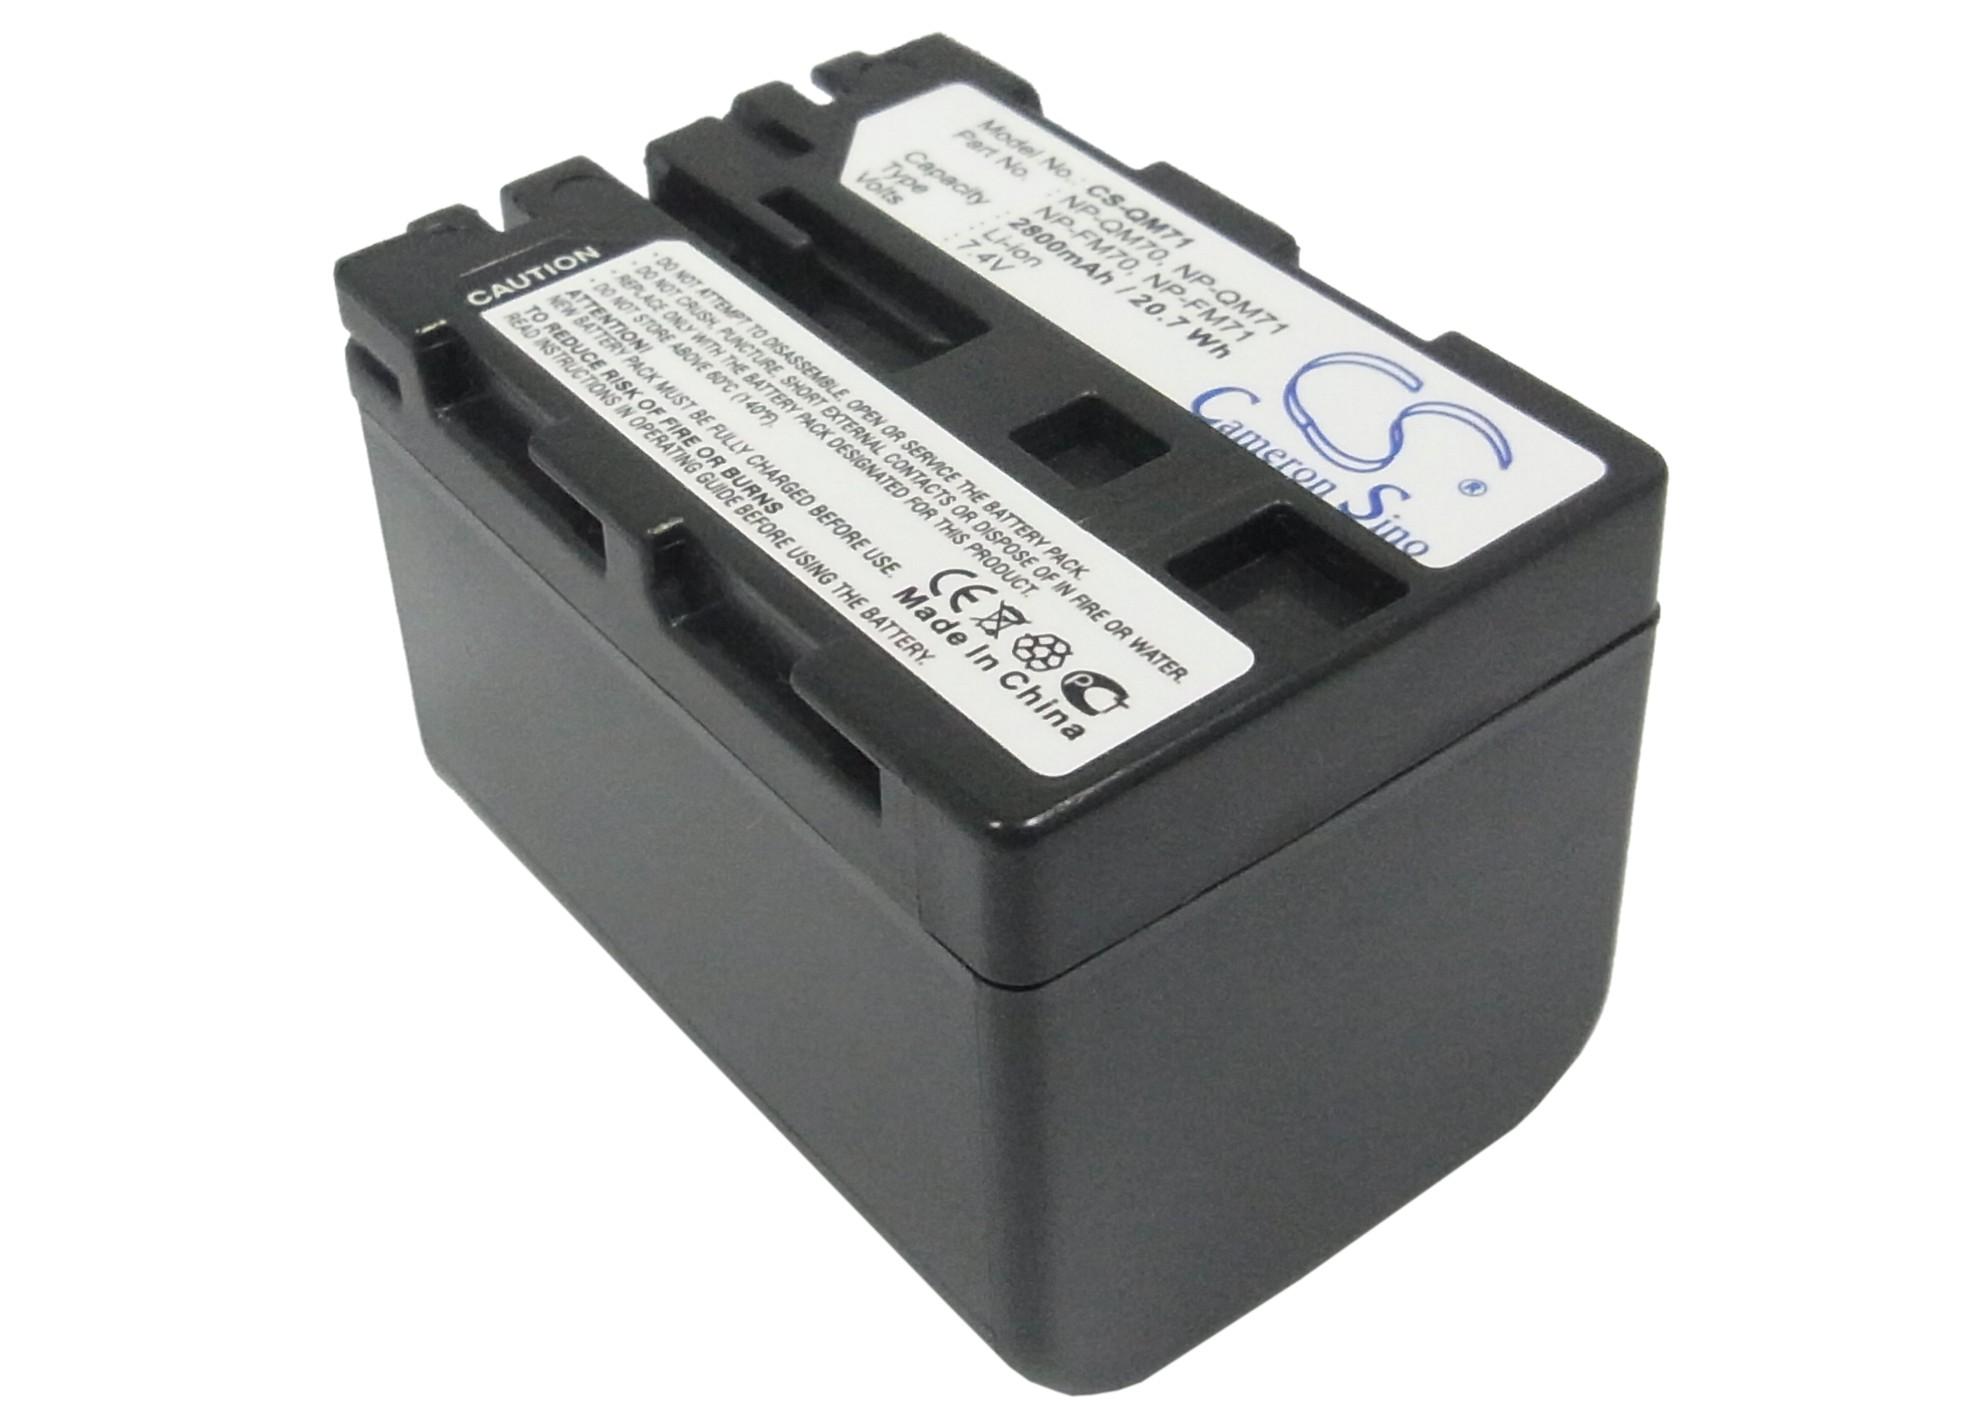 Cameron Sino baterie do kamer a fotoaparátů pro SONY DCR-TRV50 7.4V Li-ion 2800mAh tmavě šedá - neoriginální